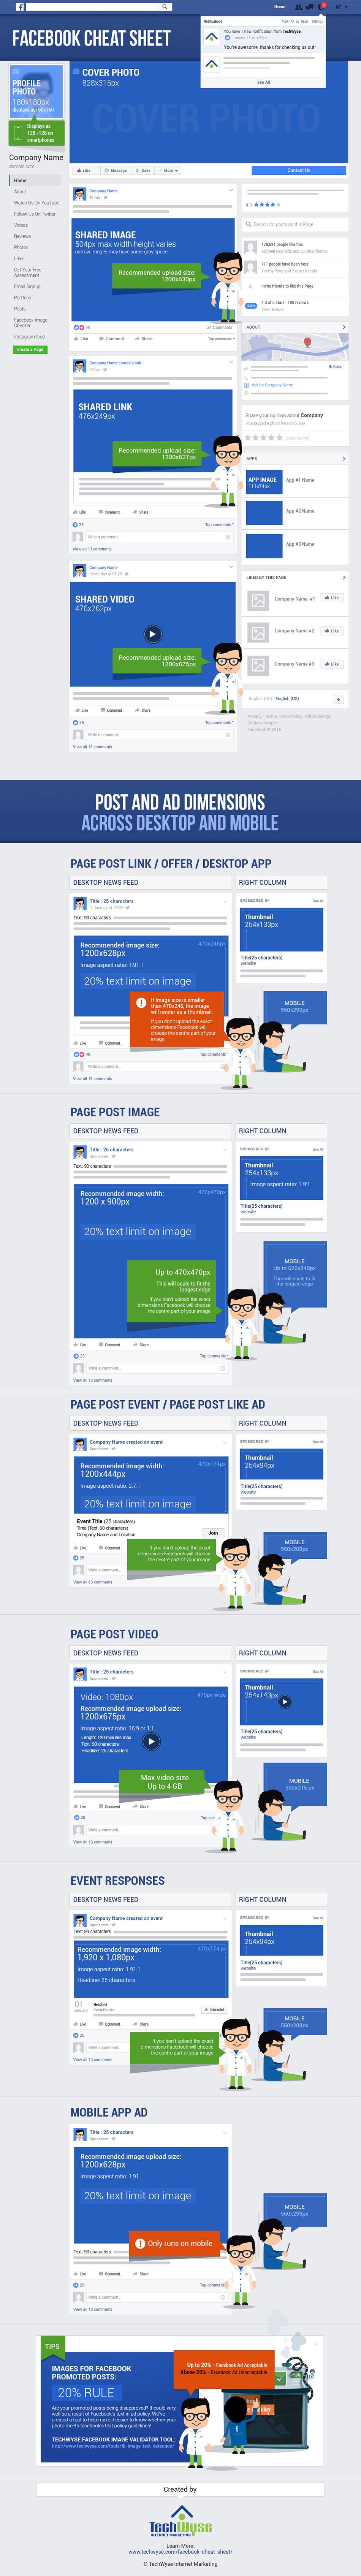 Facebook Image Cheat Sheet